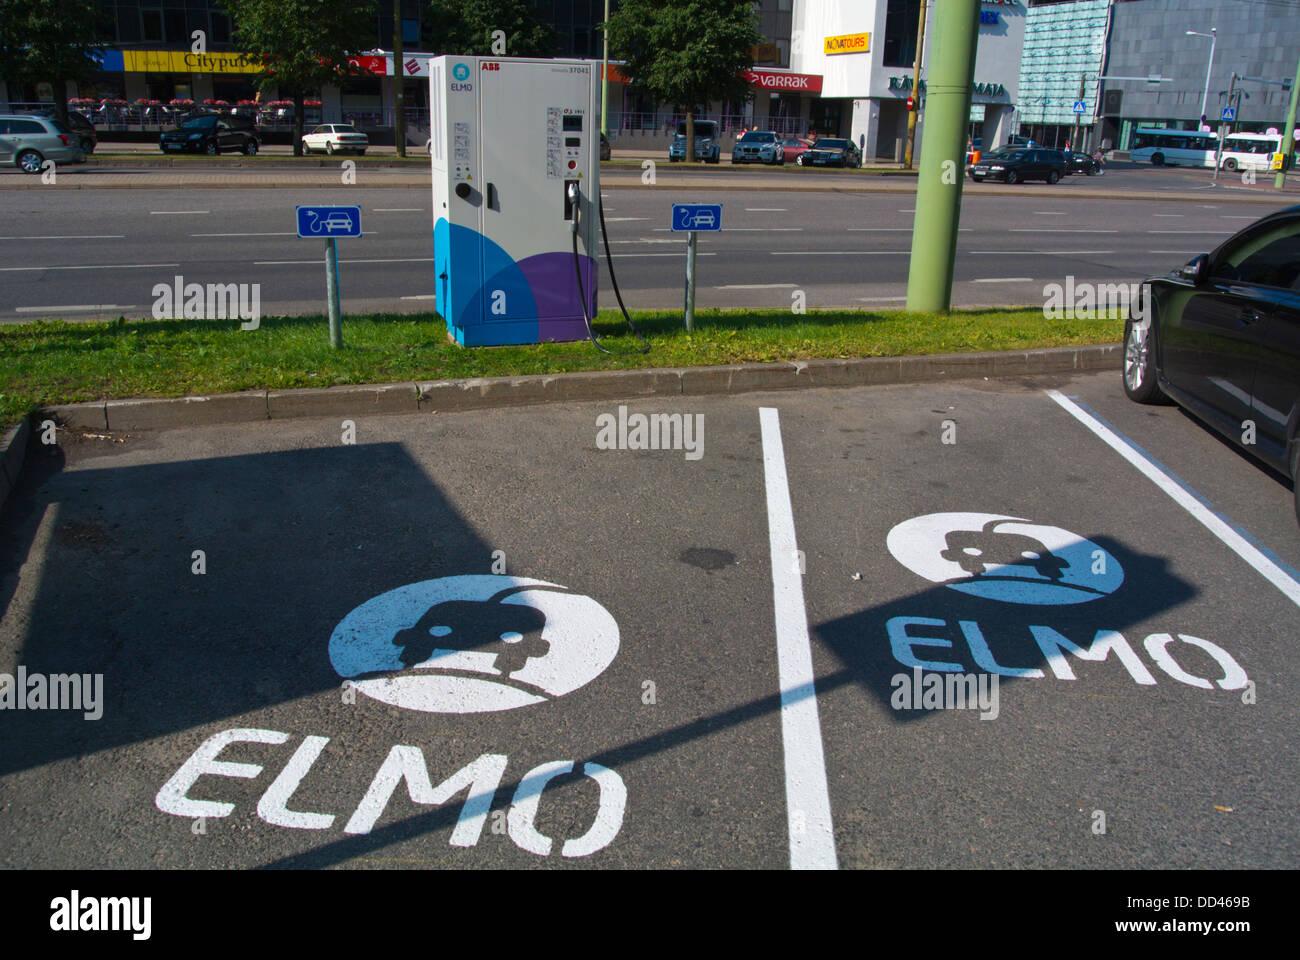 Elmo electric car charge station point Tallinn city business district Tallinn Estonia the Baltics Europe Stock Photo